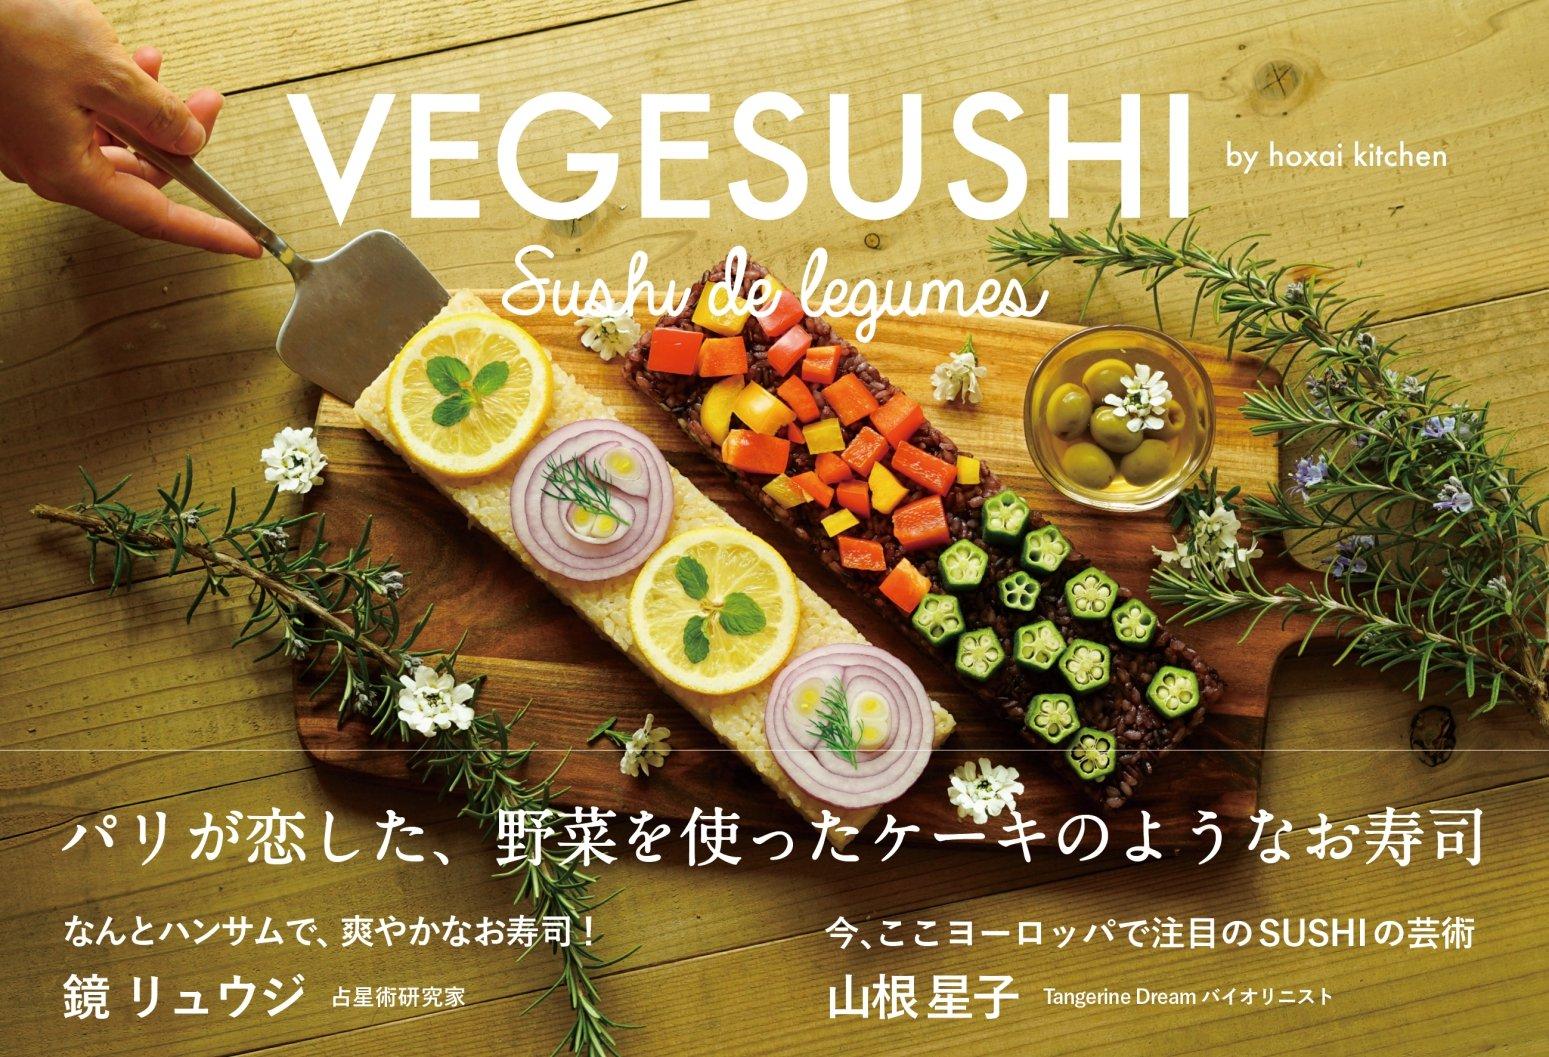 VEGESUSHI (Veggie sushi) Paris loved the sushi, such as vegetables, cakes (veggy Books) ebook